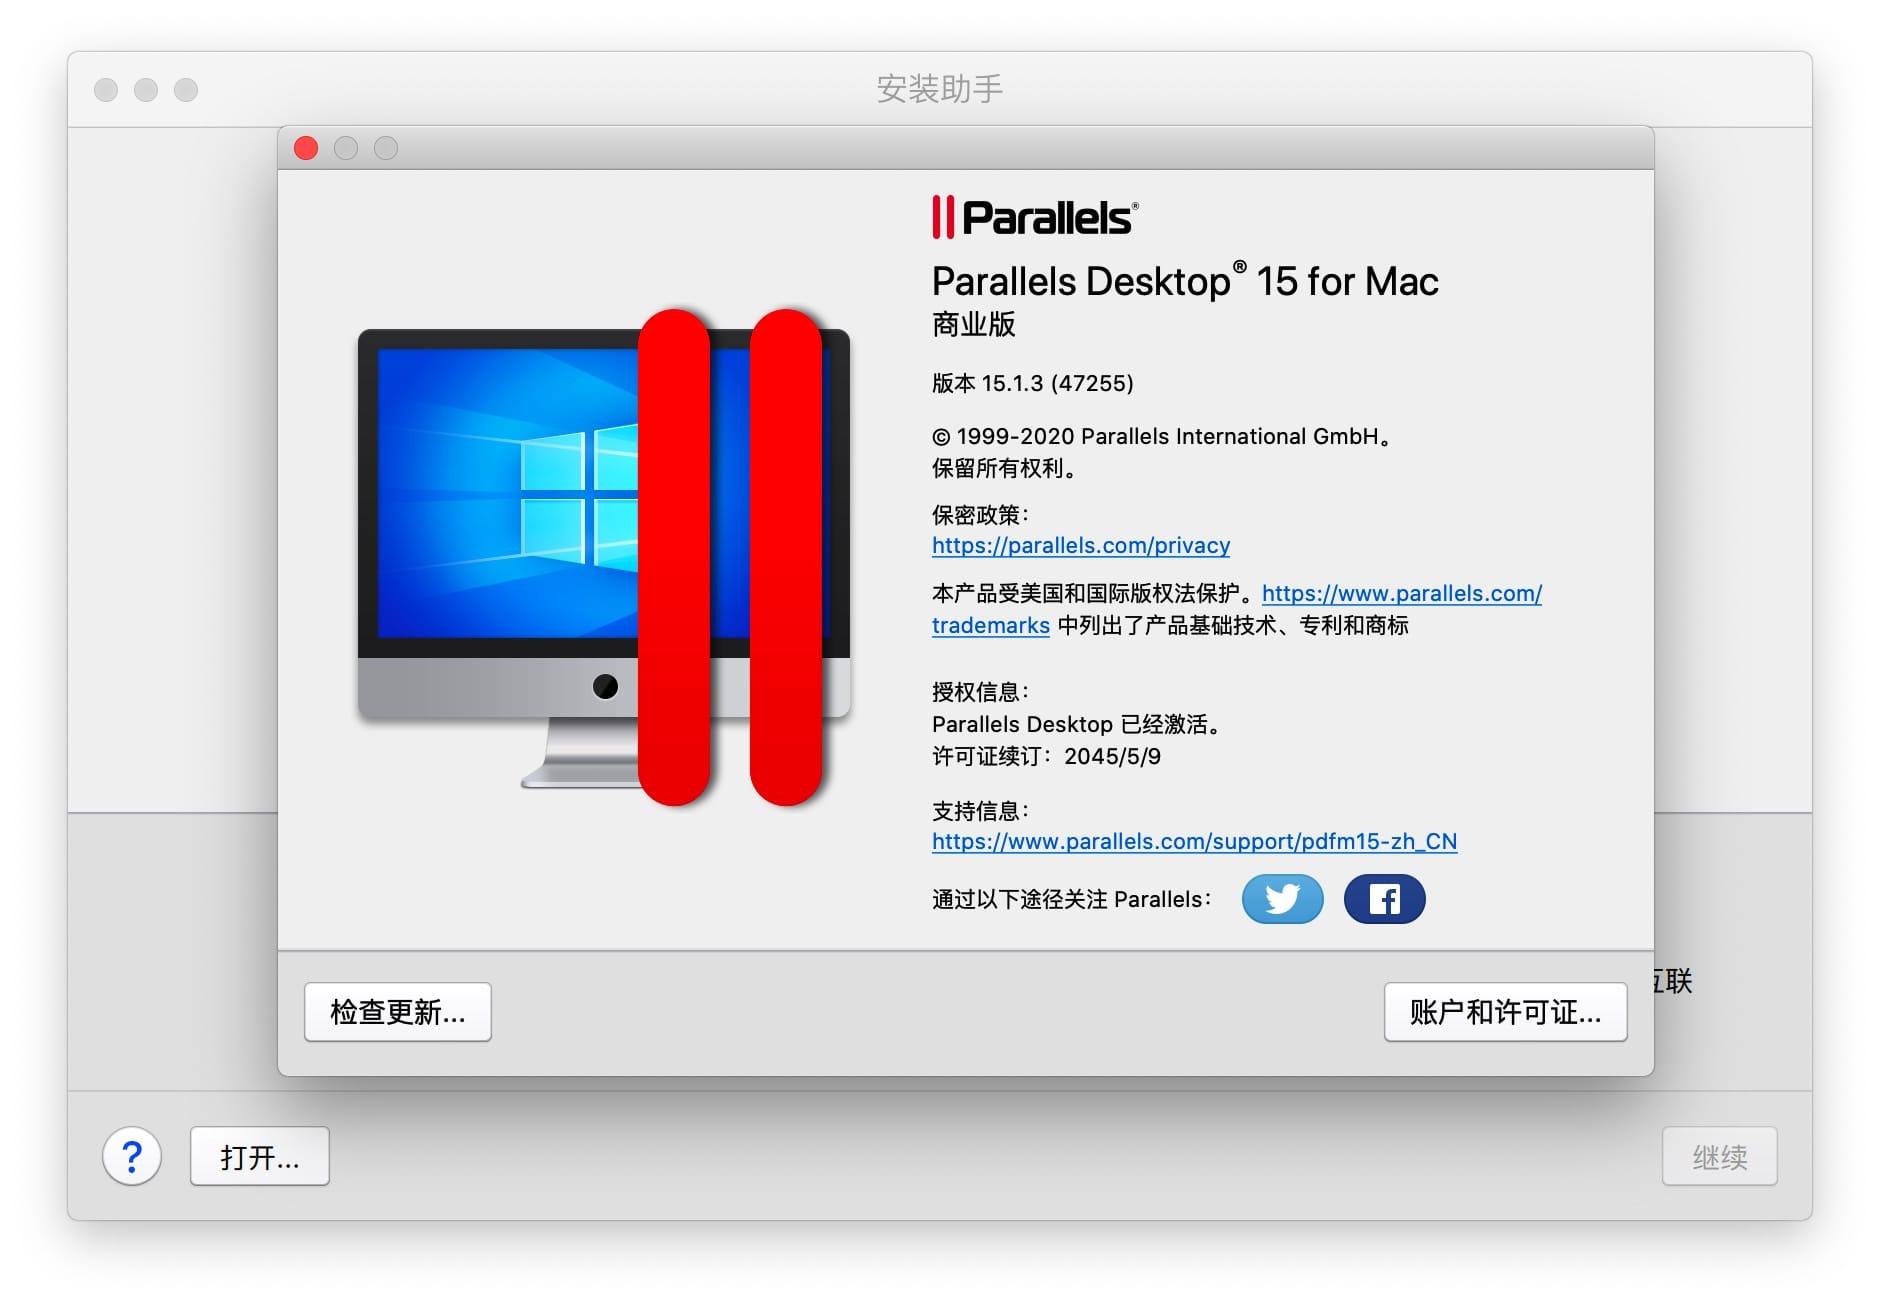 Parallels Desktop Business Edition 15.1.4.47270  中文破解版  最佳 Mac 虚拟机解决方案  第2张